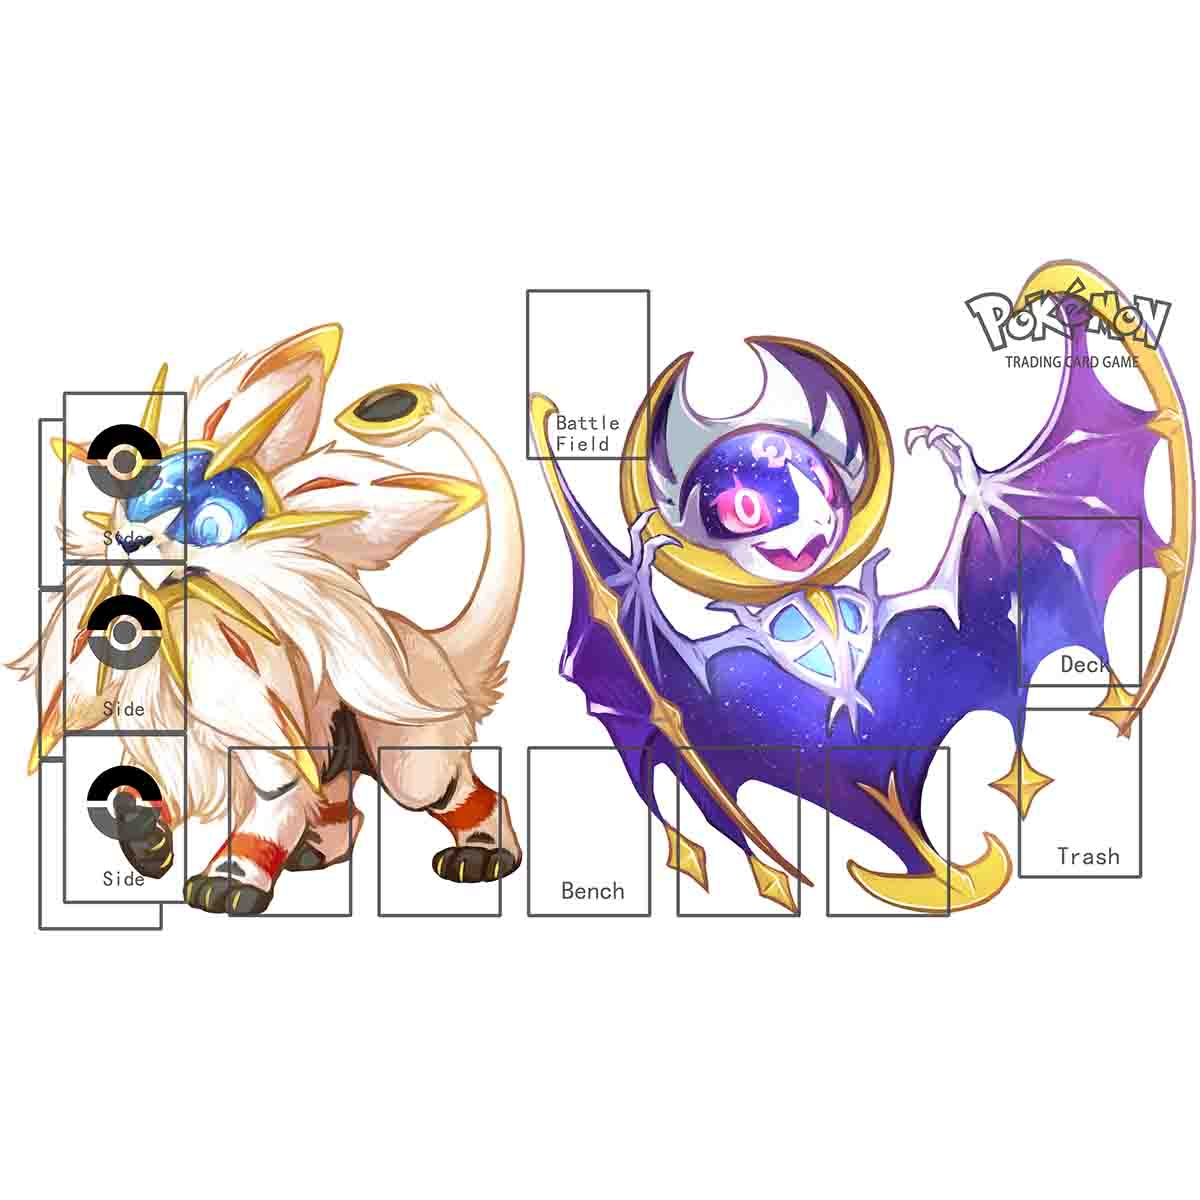 Tomy PTCG Accessories Pokemon SUN MOON Playmat Card Table Game Venusaur Blastoise Totodile Torchic Toys For Children